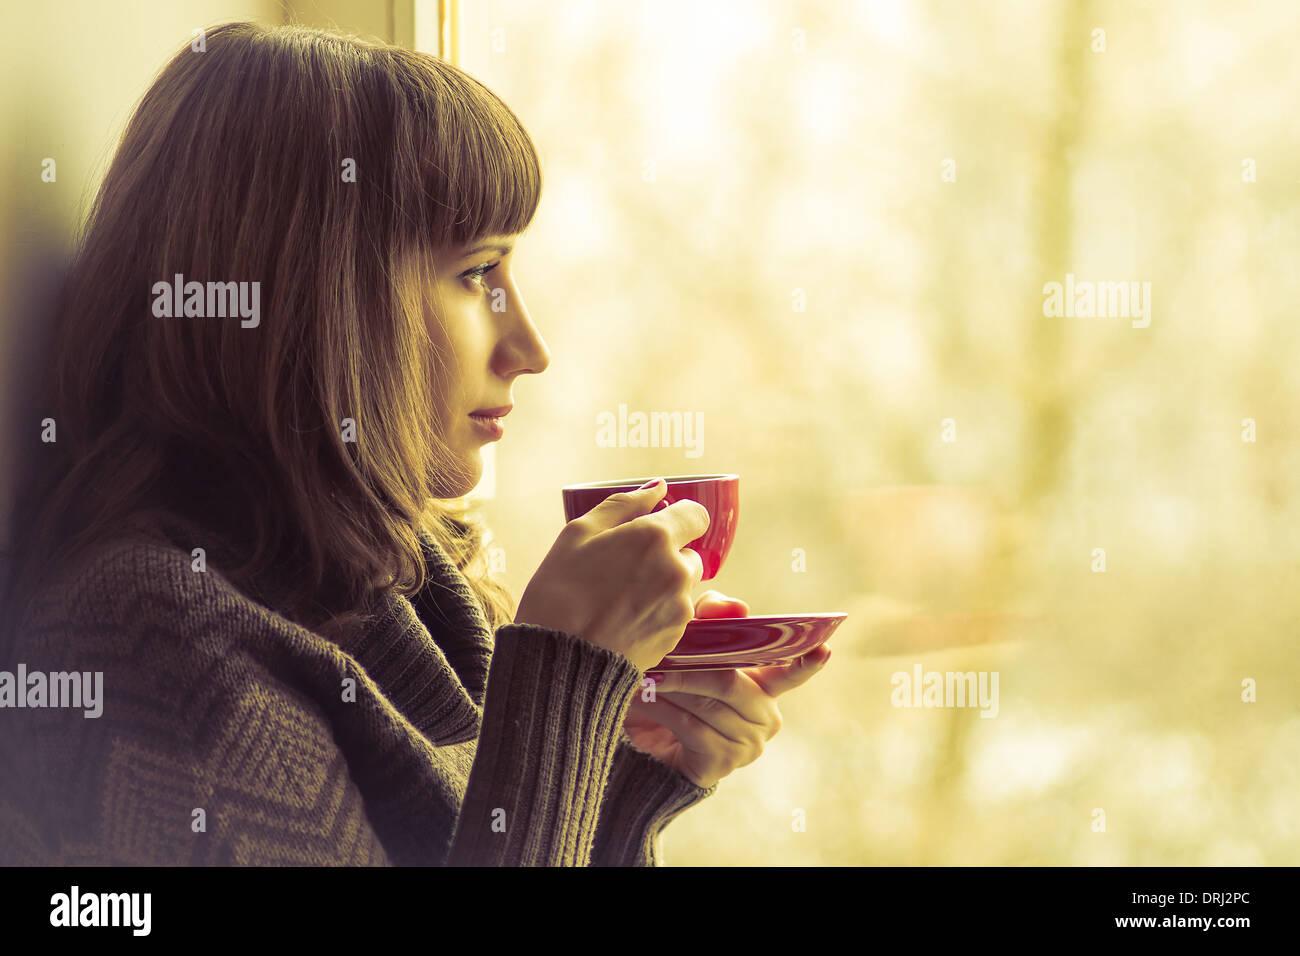 Coffee. Pretty Girl drinking Coffee or Tea near Window. Warm colors toned - Stock Image